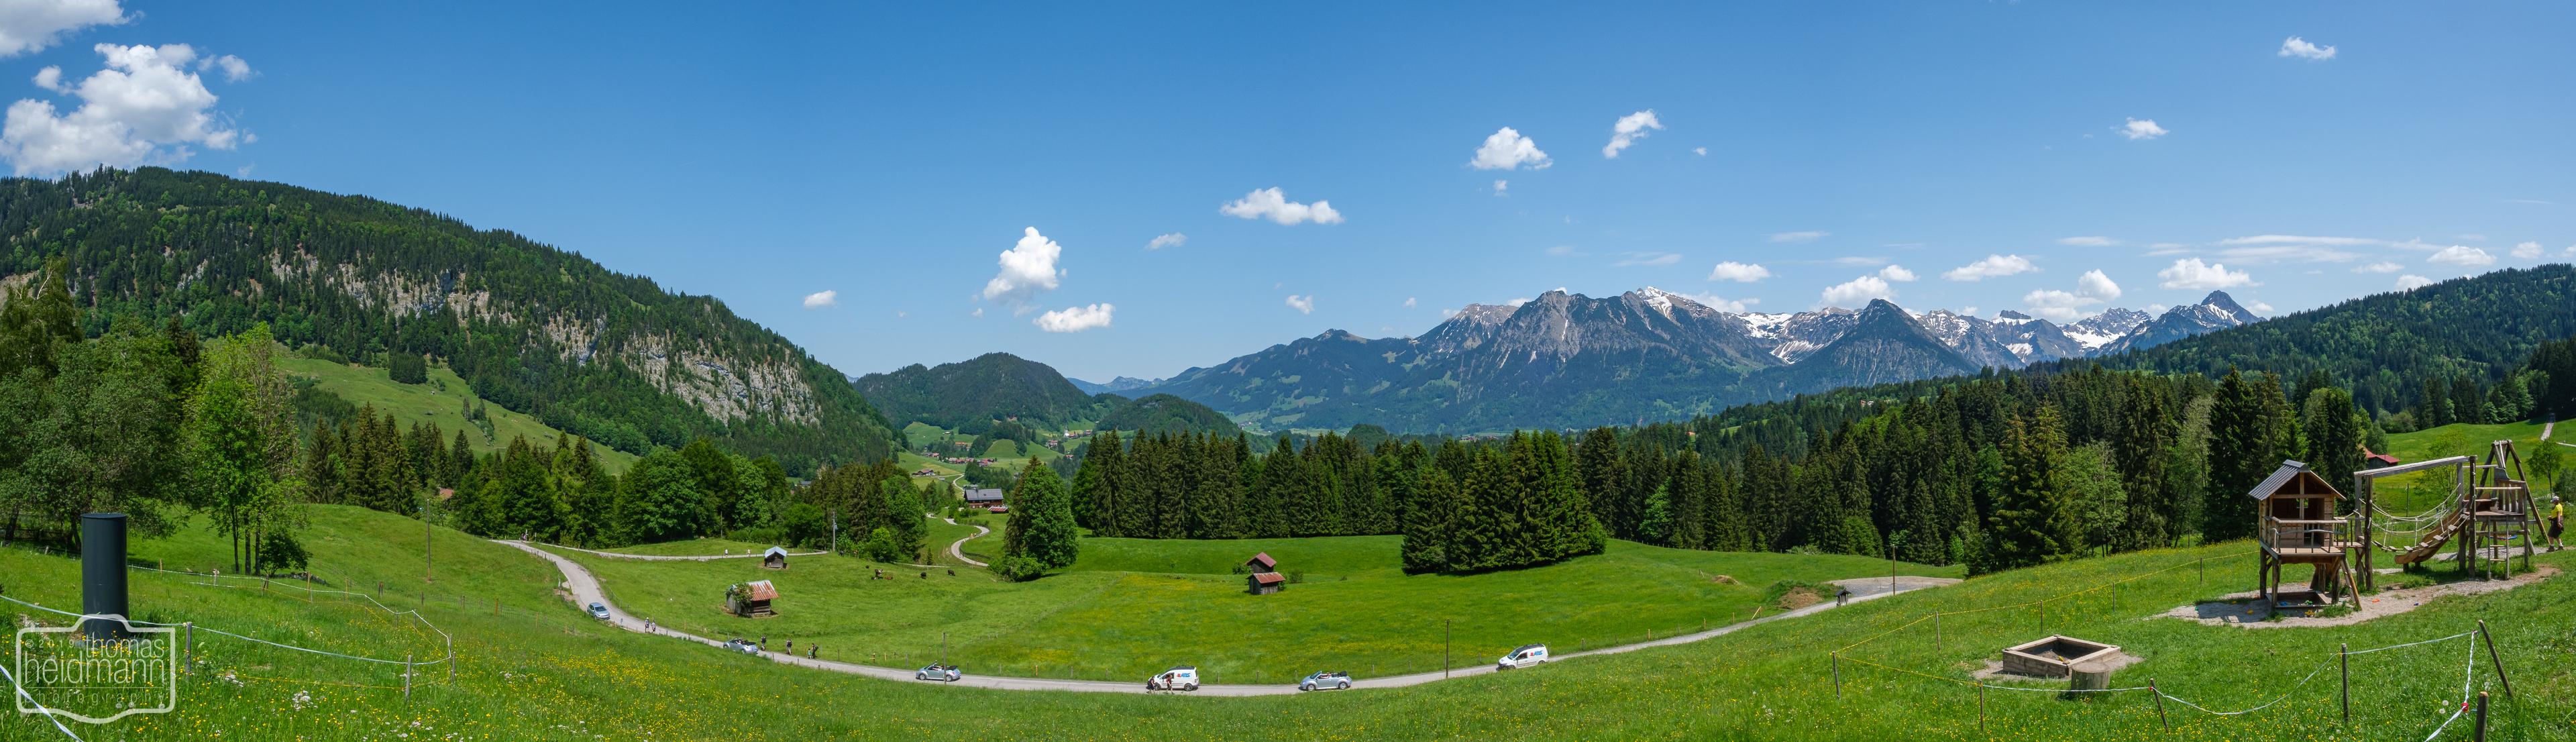 Alpenpanorama bei Oberstdorf